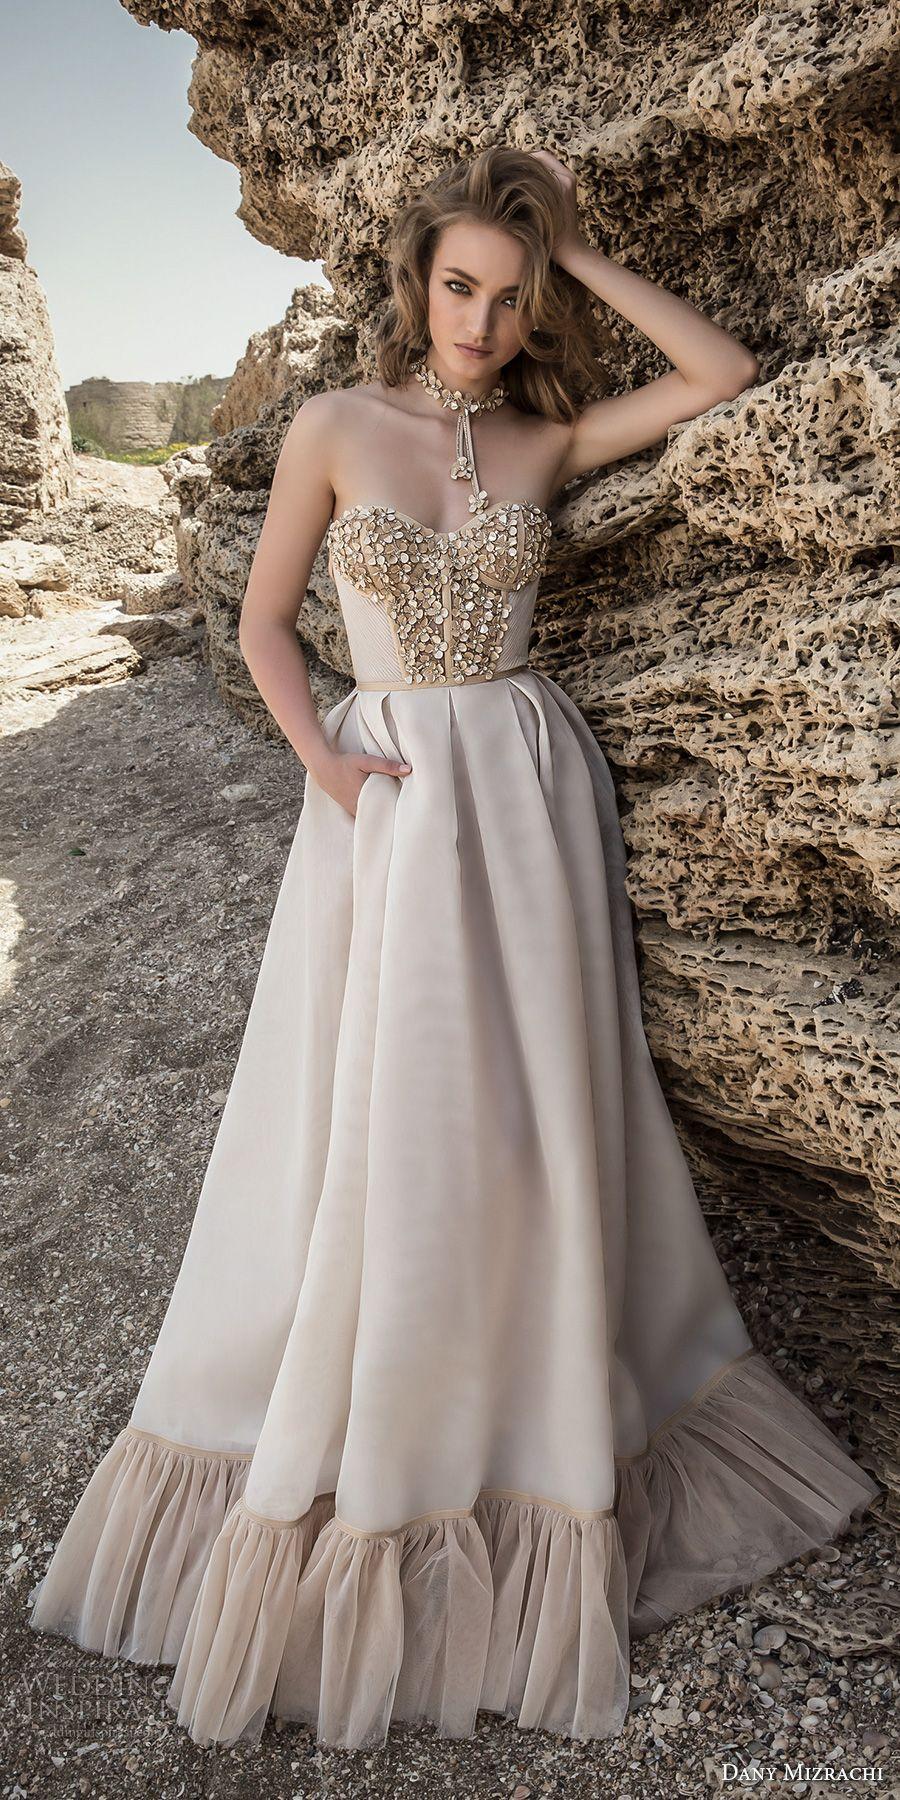 Champagne colored wedding dress  Dany Mizrachi  Wedding Dresses  Strapless sweetheart neckline